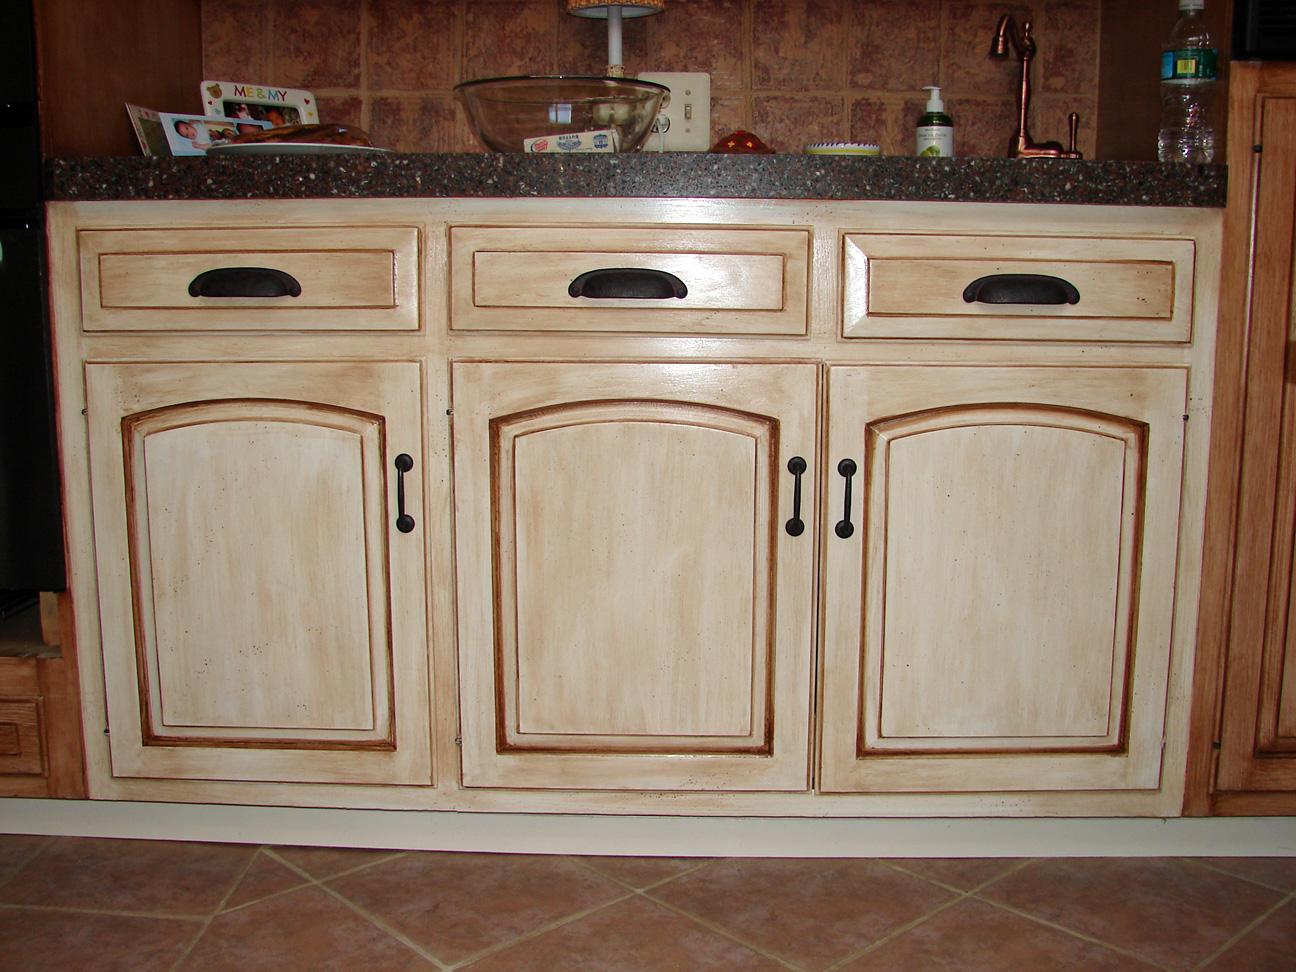 Kitchen Hutch Cabinet Granite Countertop Decorative Effect Of Walls Furniture Cabinets